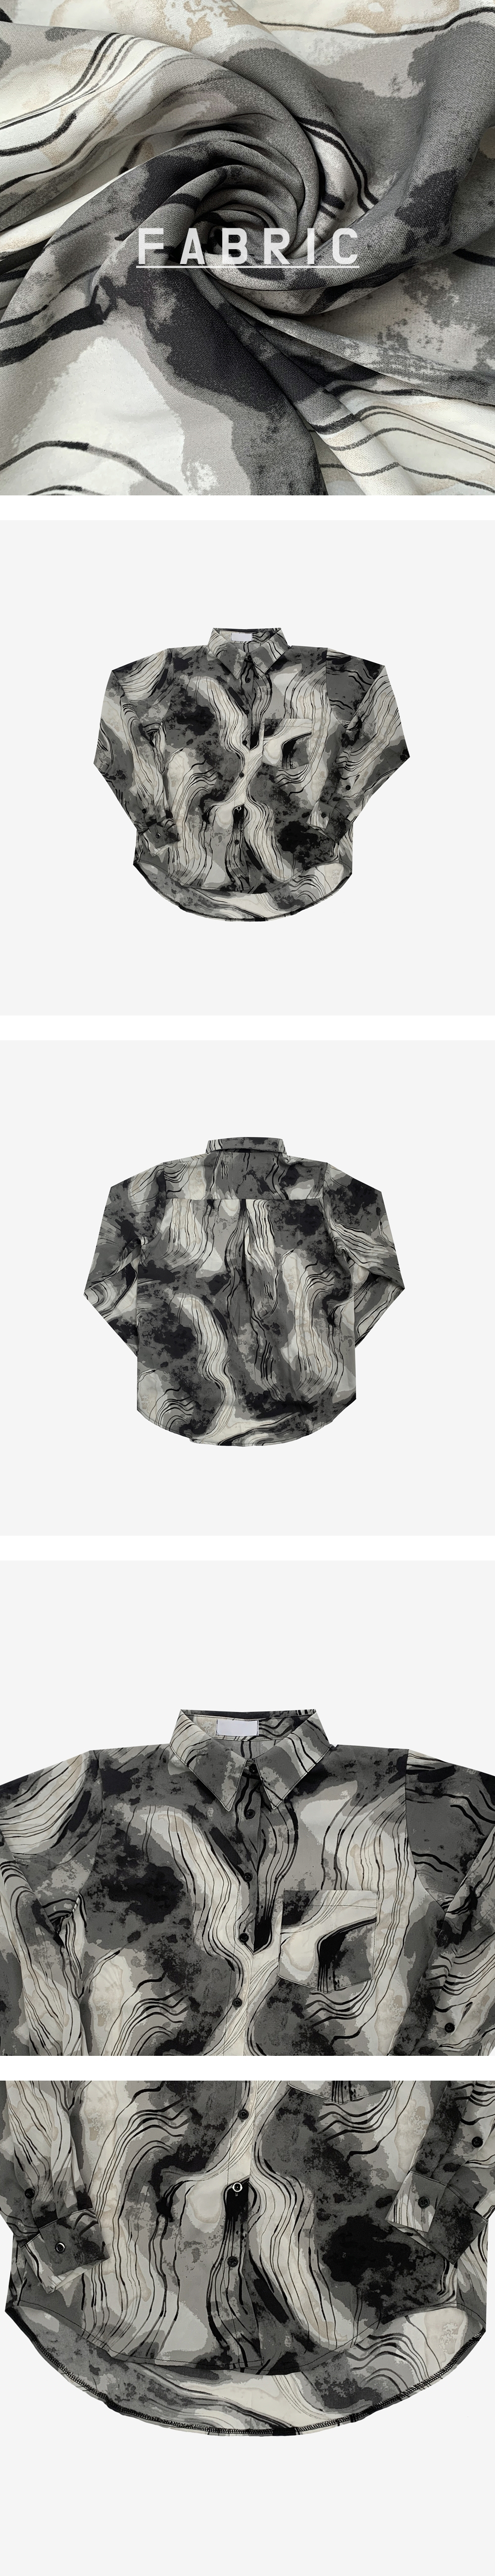 rican ethnic pattern shirt